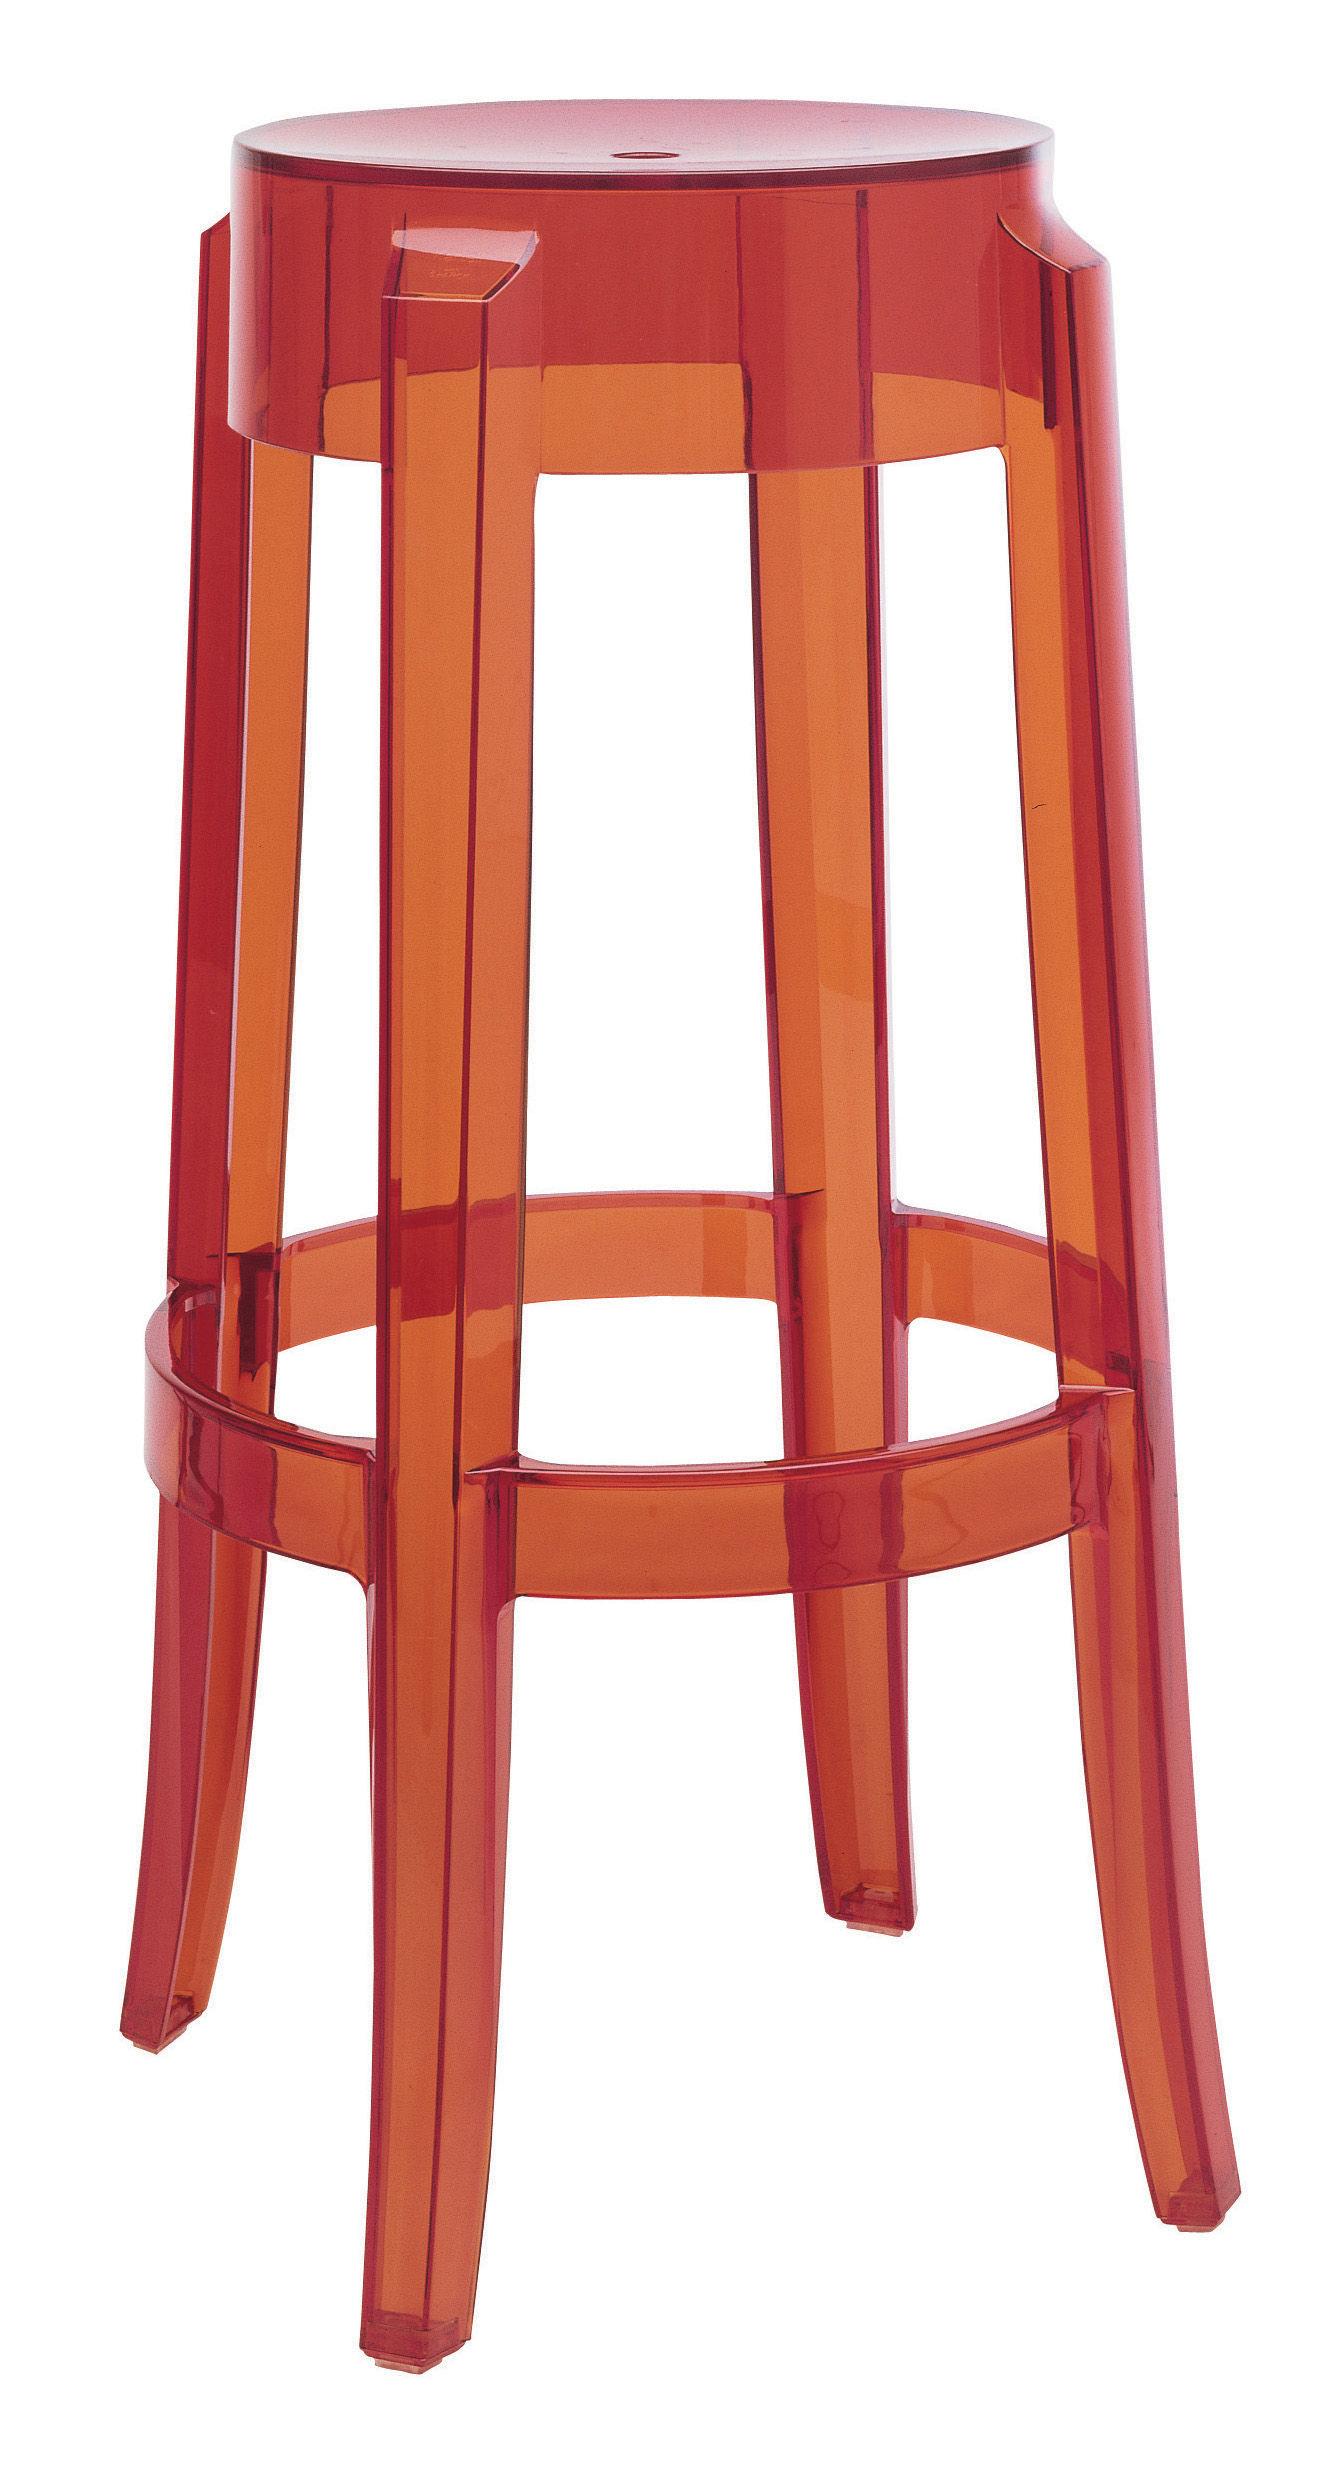 Charles Ghost Bar Stool H 75 Cm Plastic Orange By Kartell